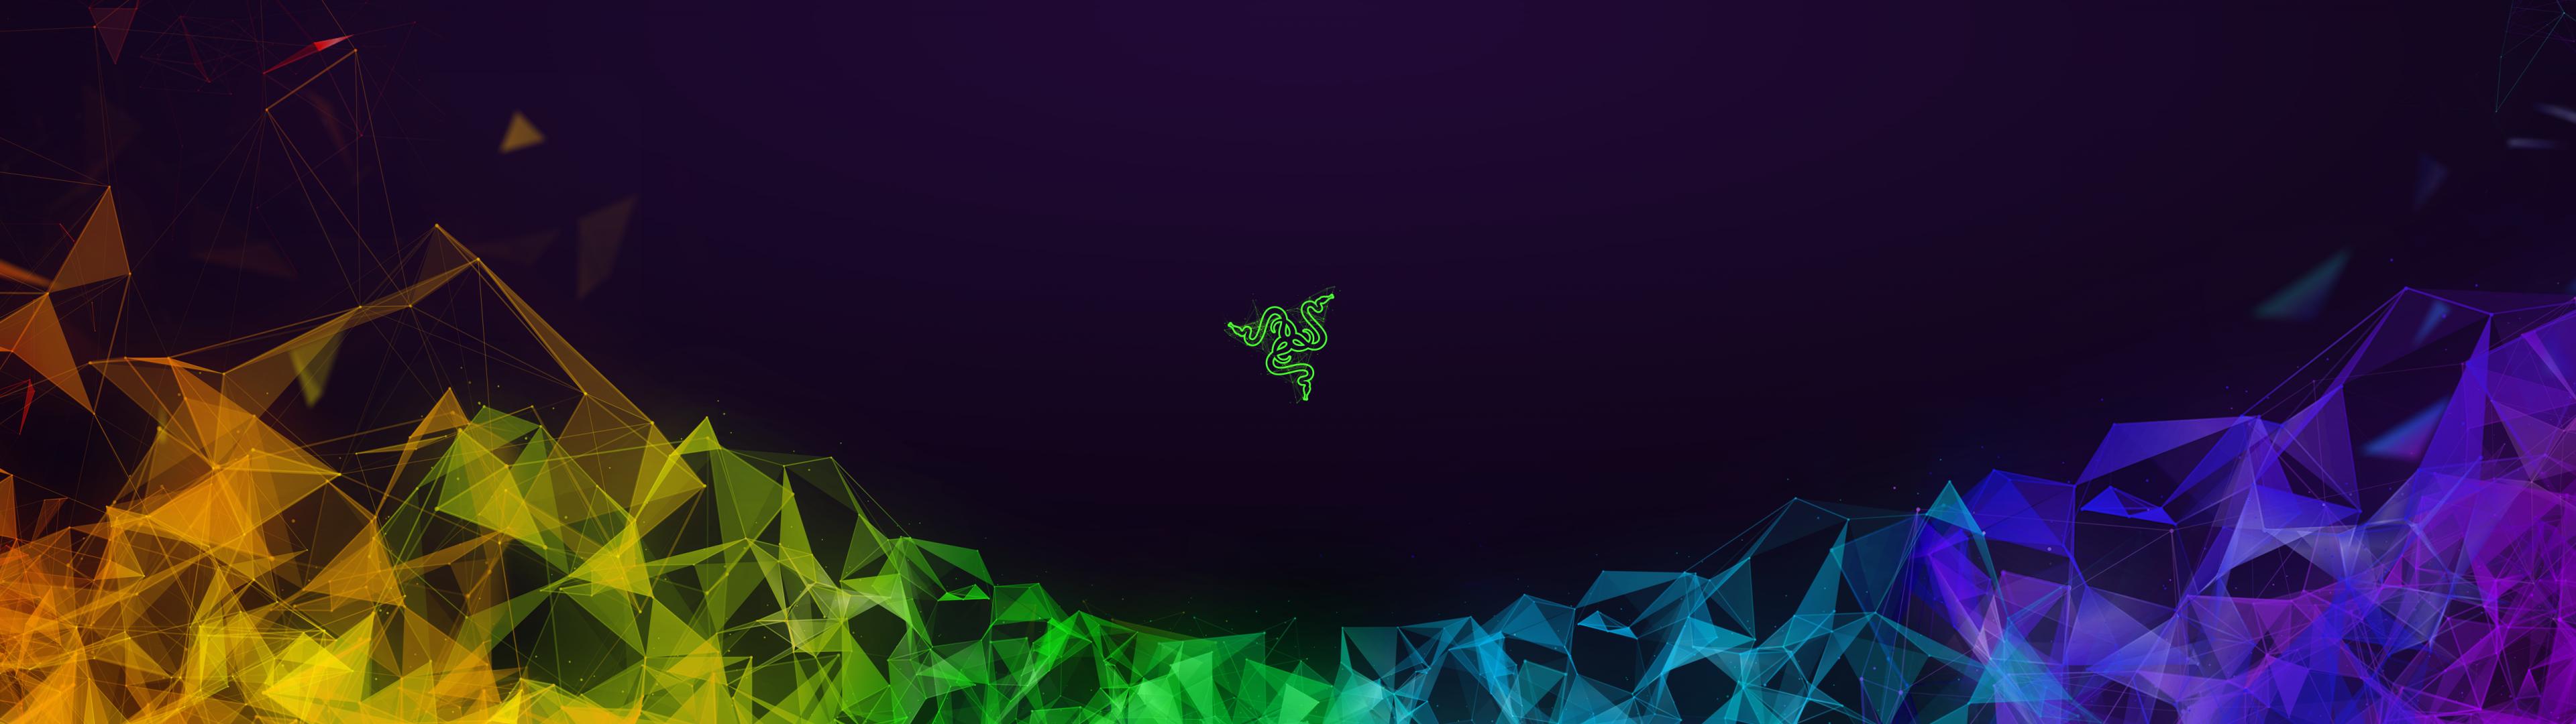 Razer, Triple Monitor, Digital Art, Gaming - Razer Wallpaper Dual Monitor - HD Wallpaper